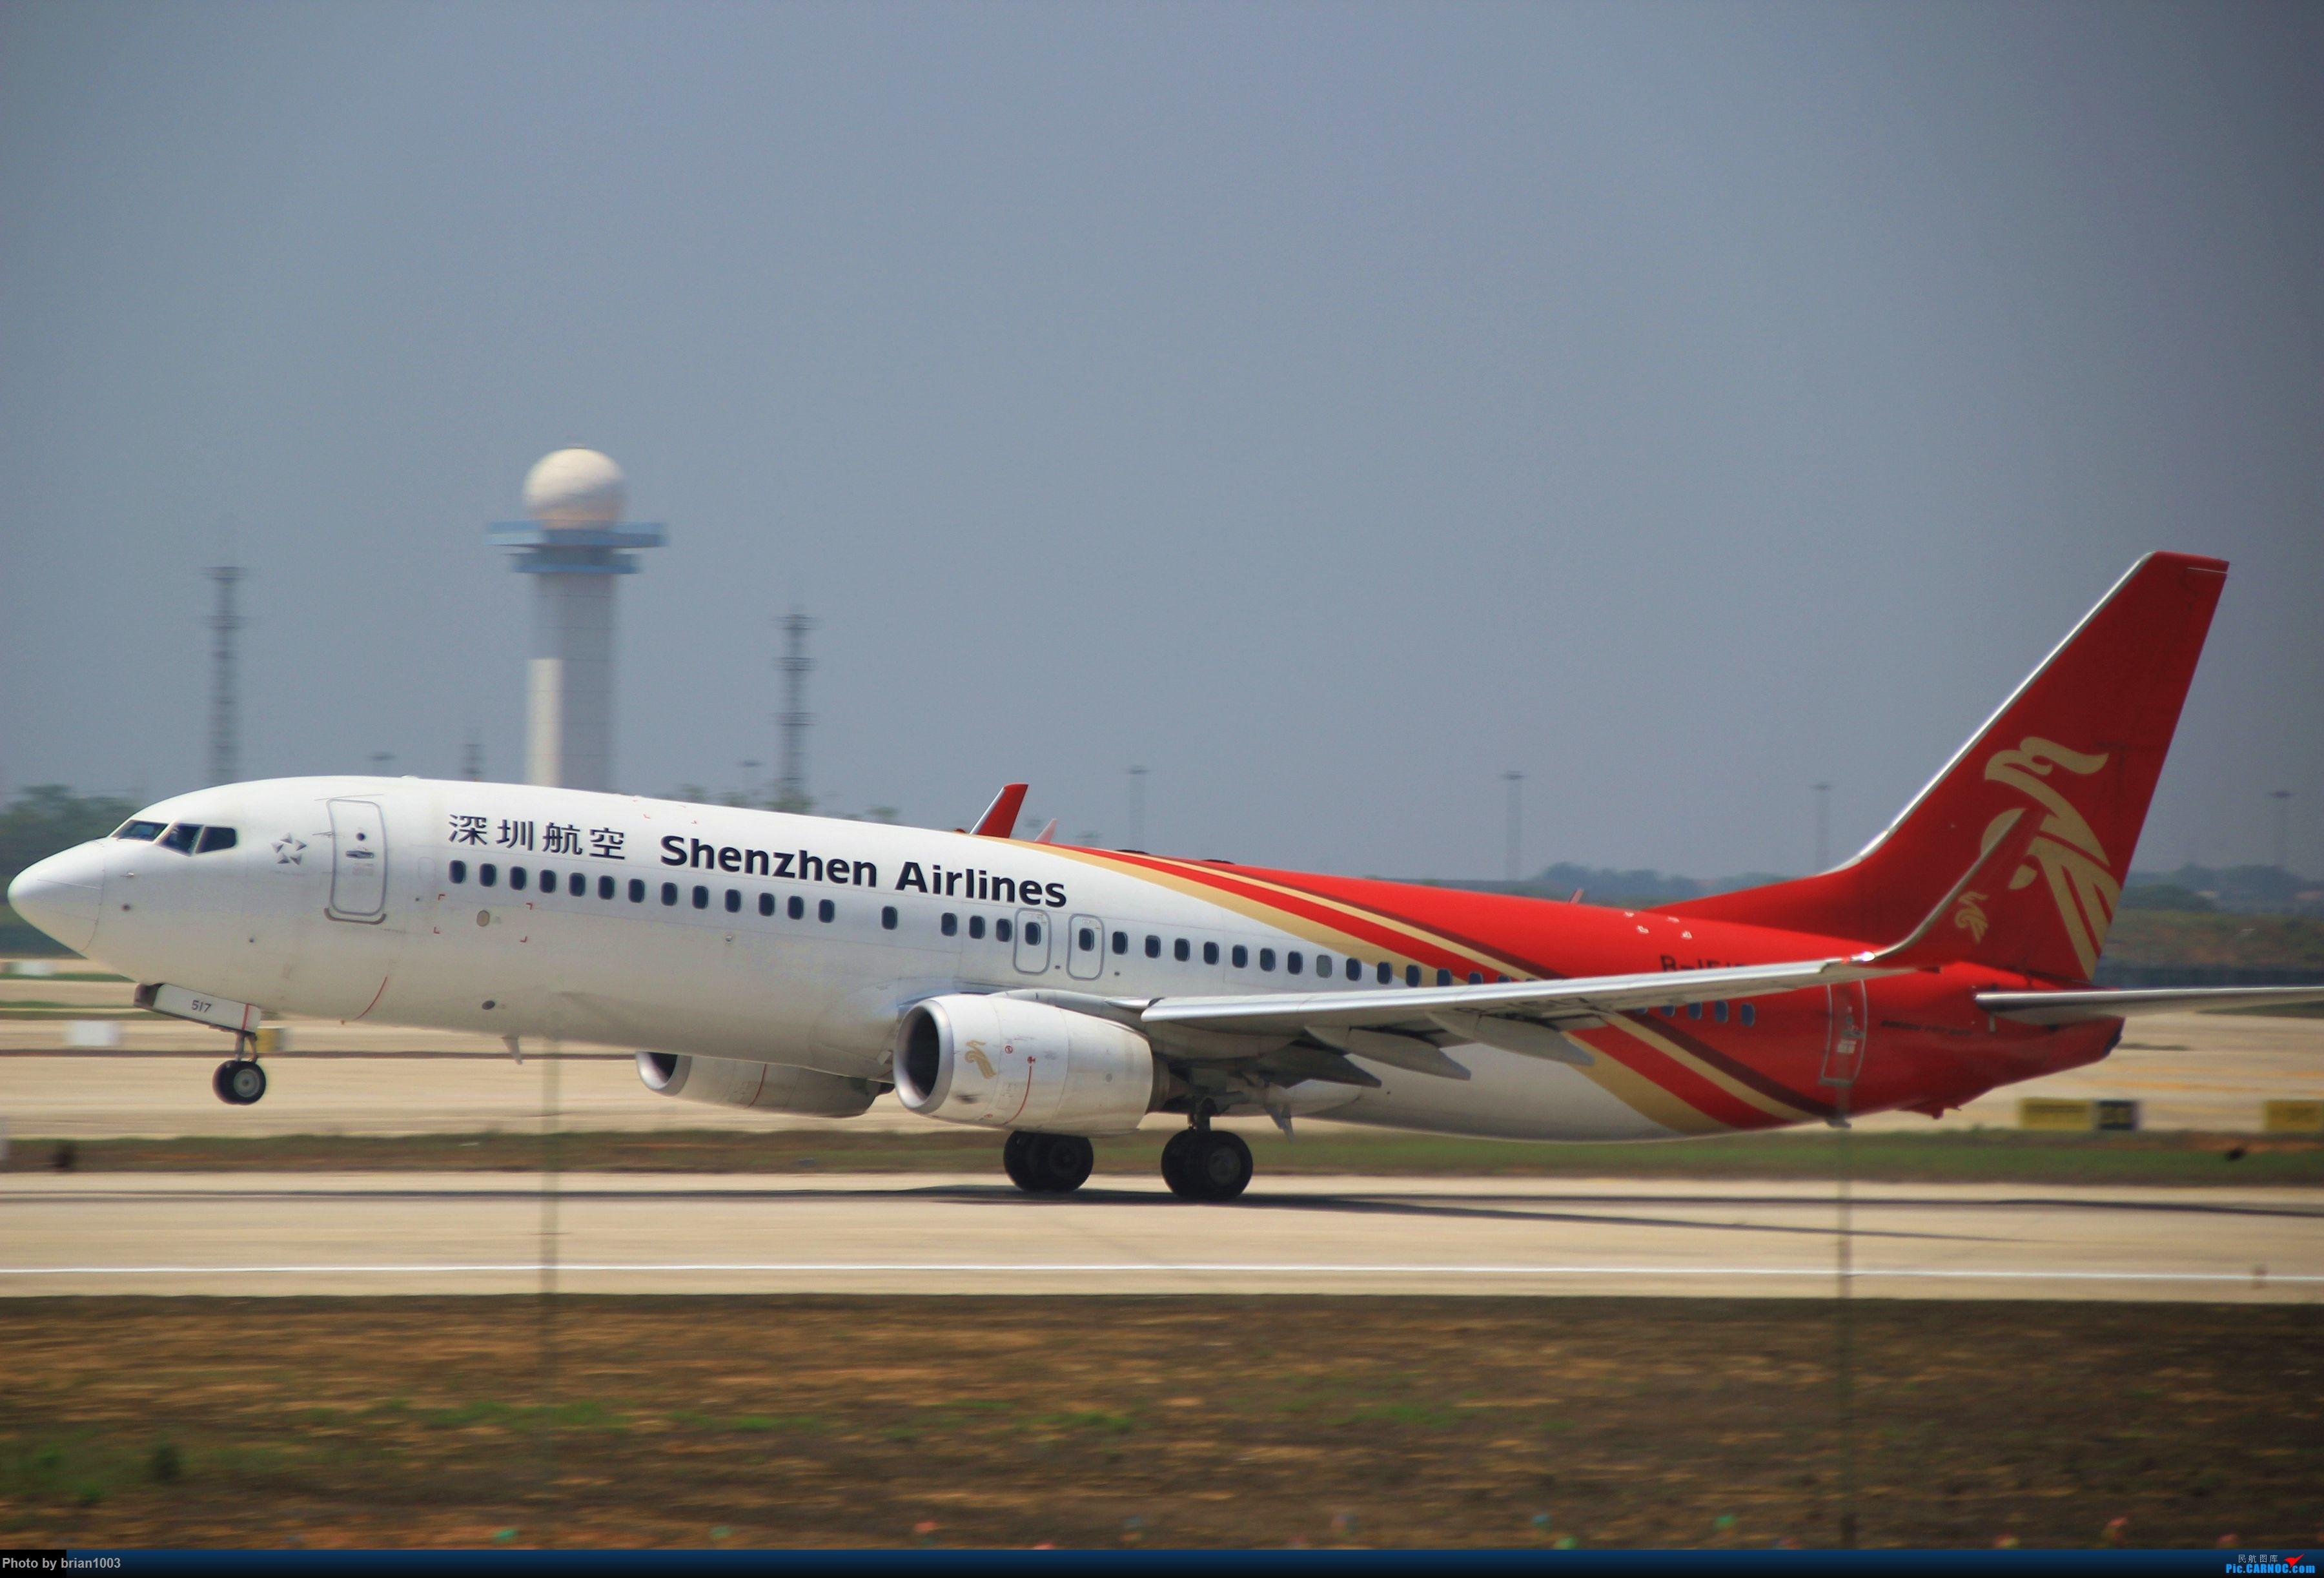 Re:[原创]WUH武汉天河机场拍机之喜迎酷航788和偶遇某其他飞机 BOEING 737-800 B-1517